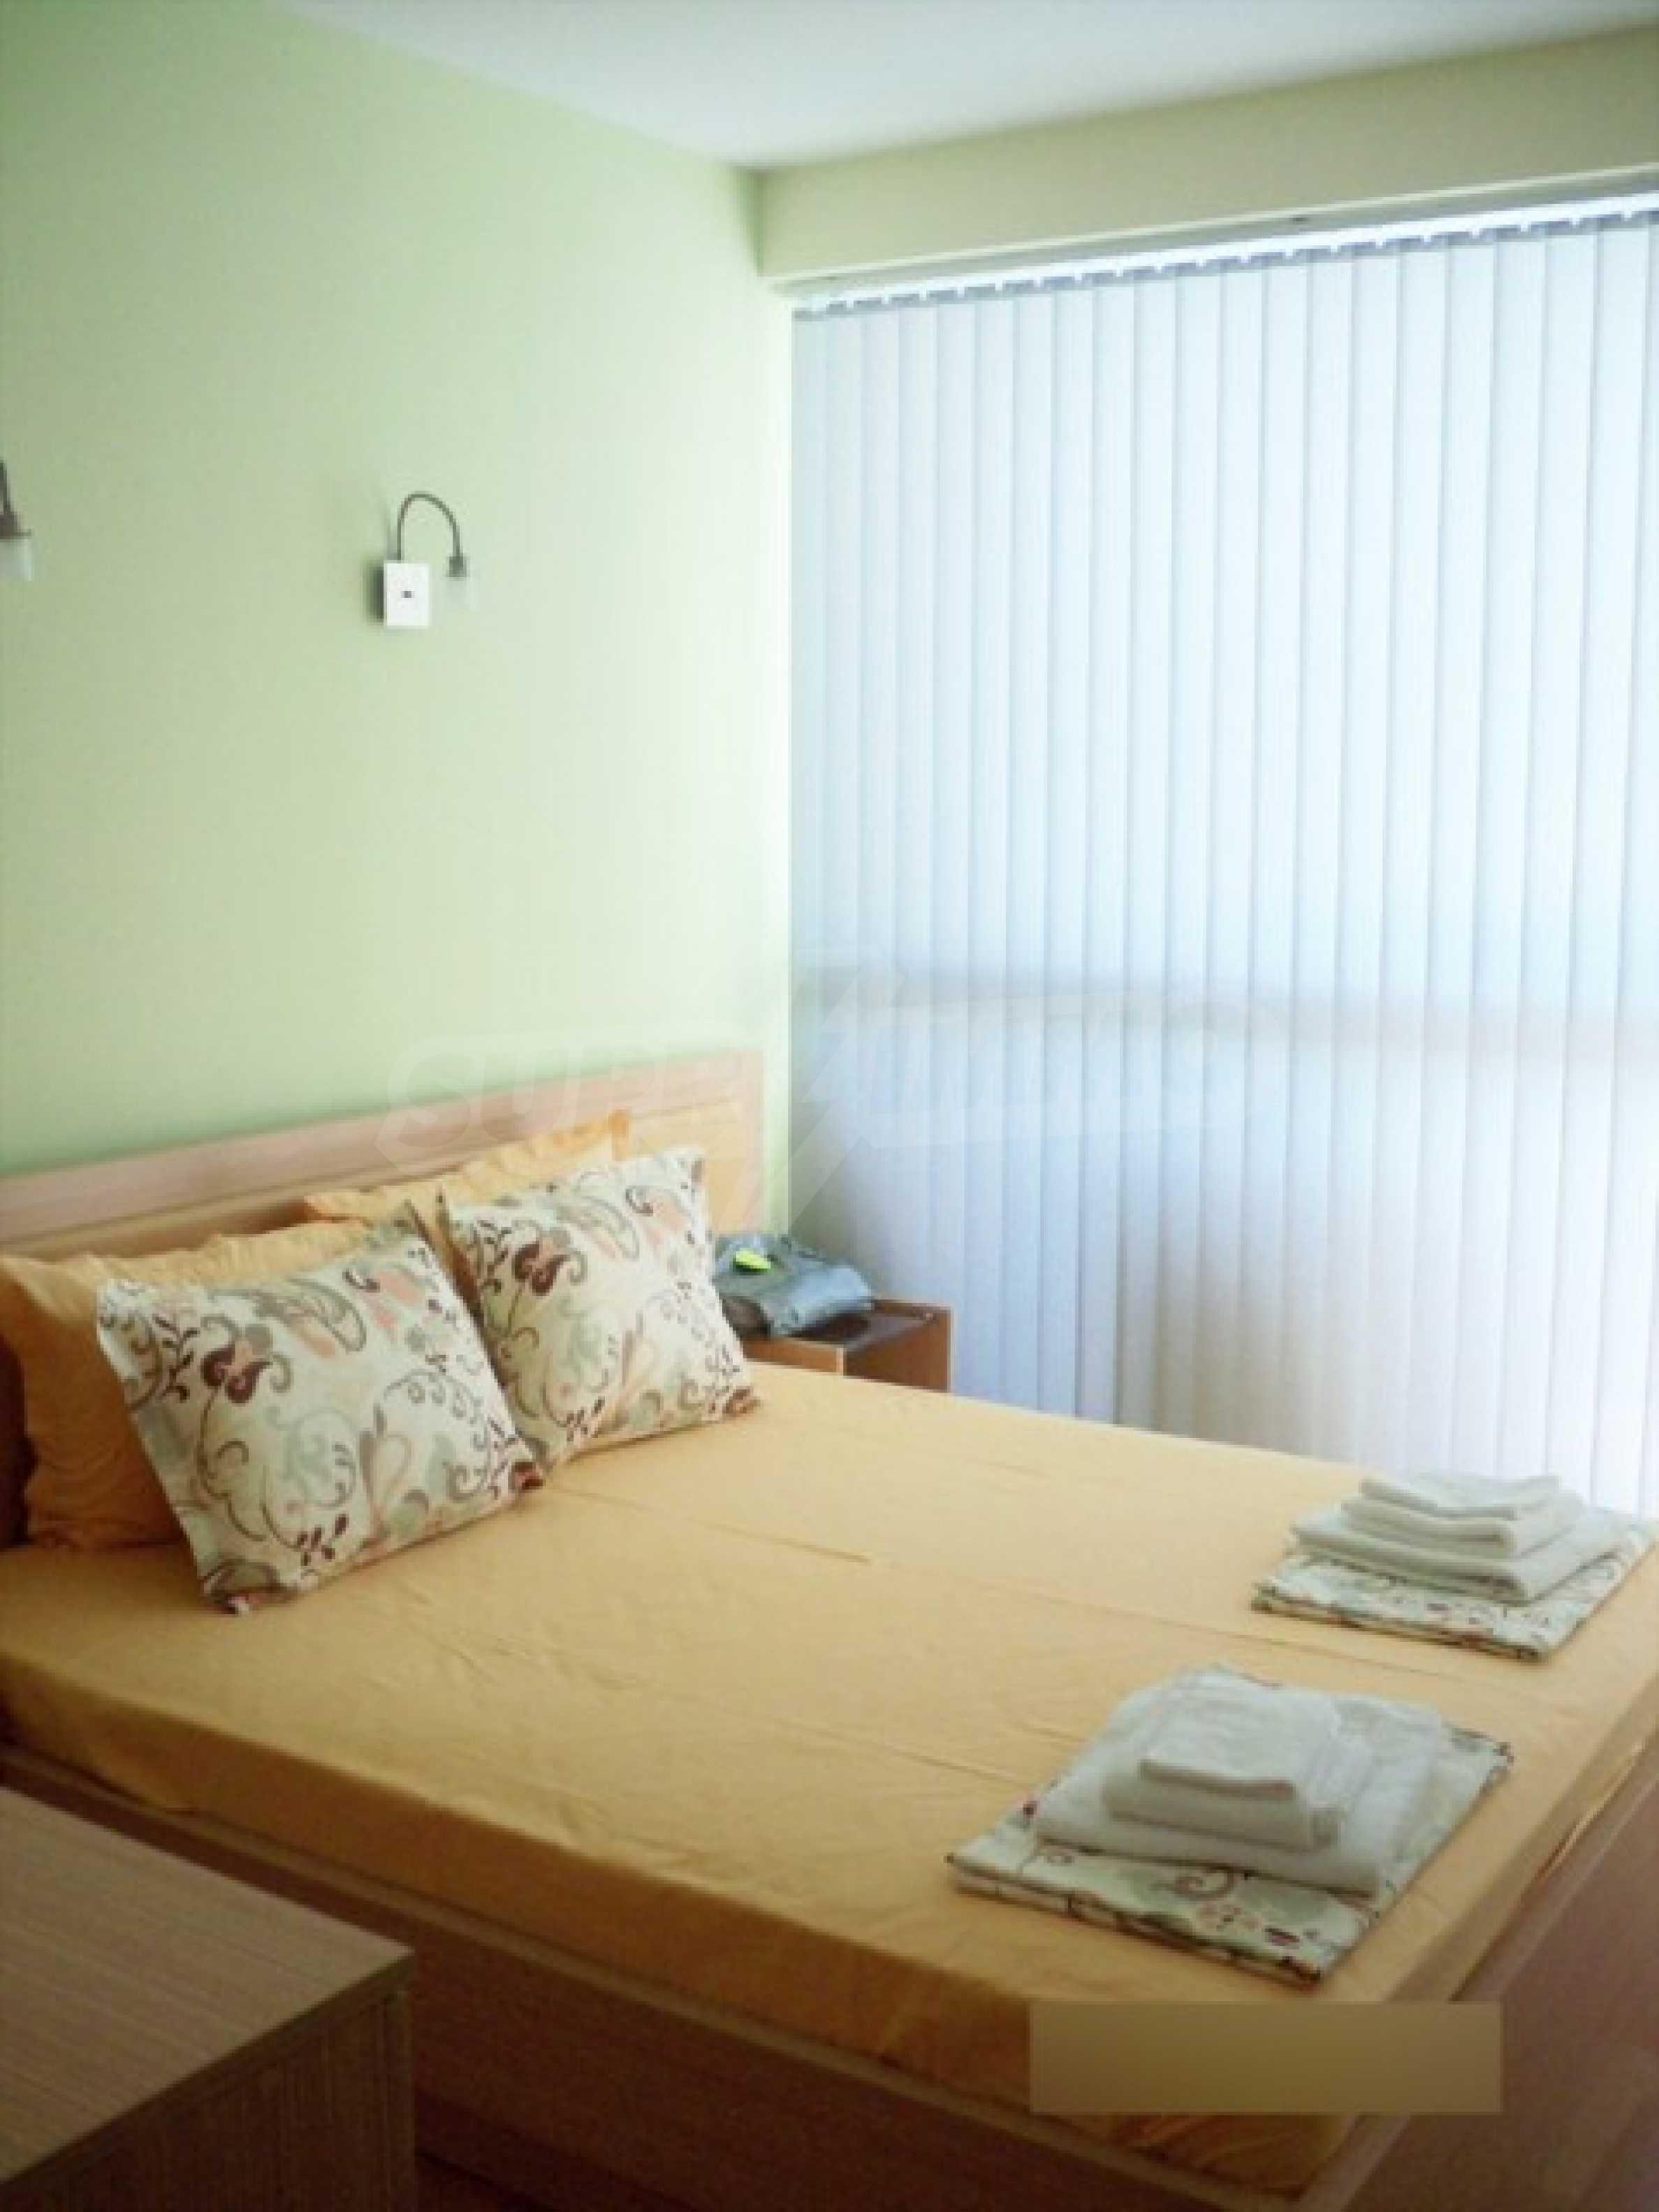 Тристаен апартамент за продажба в Поморие 14